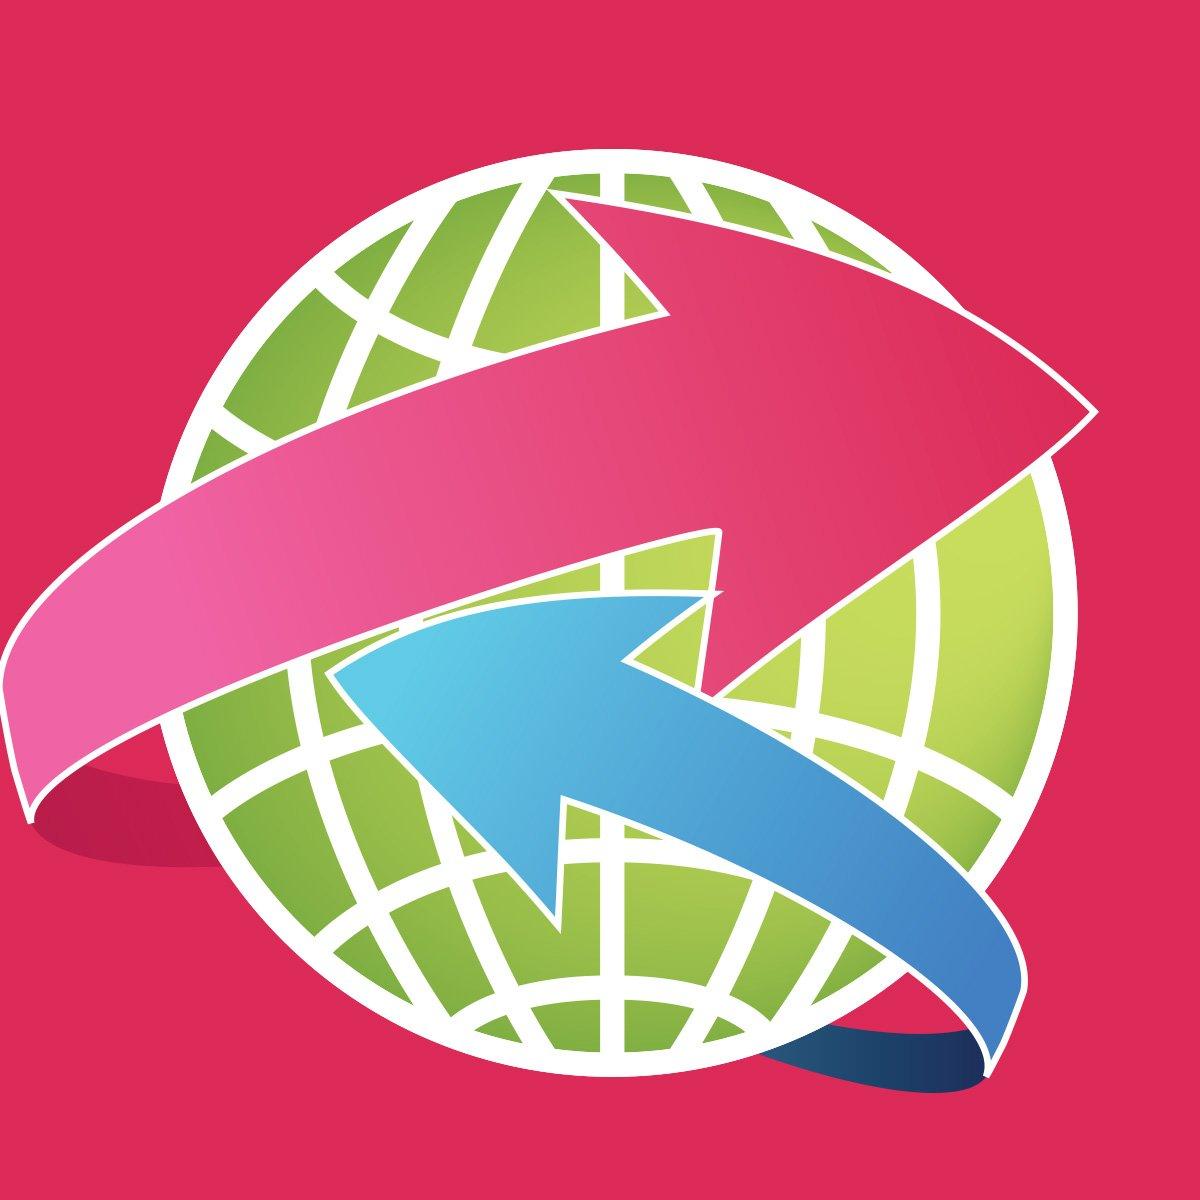 Shopify Redirect app by Mod media